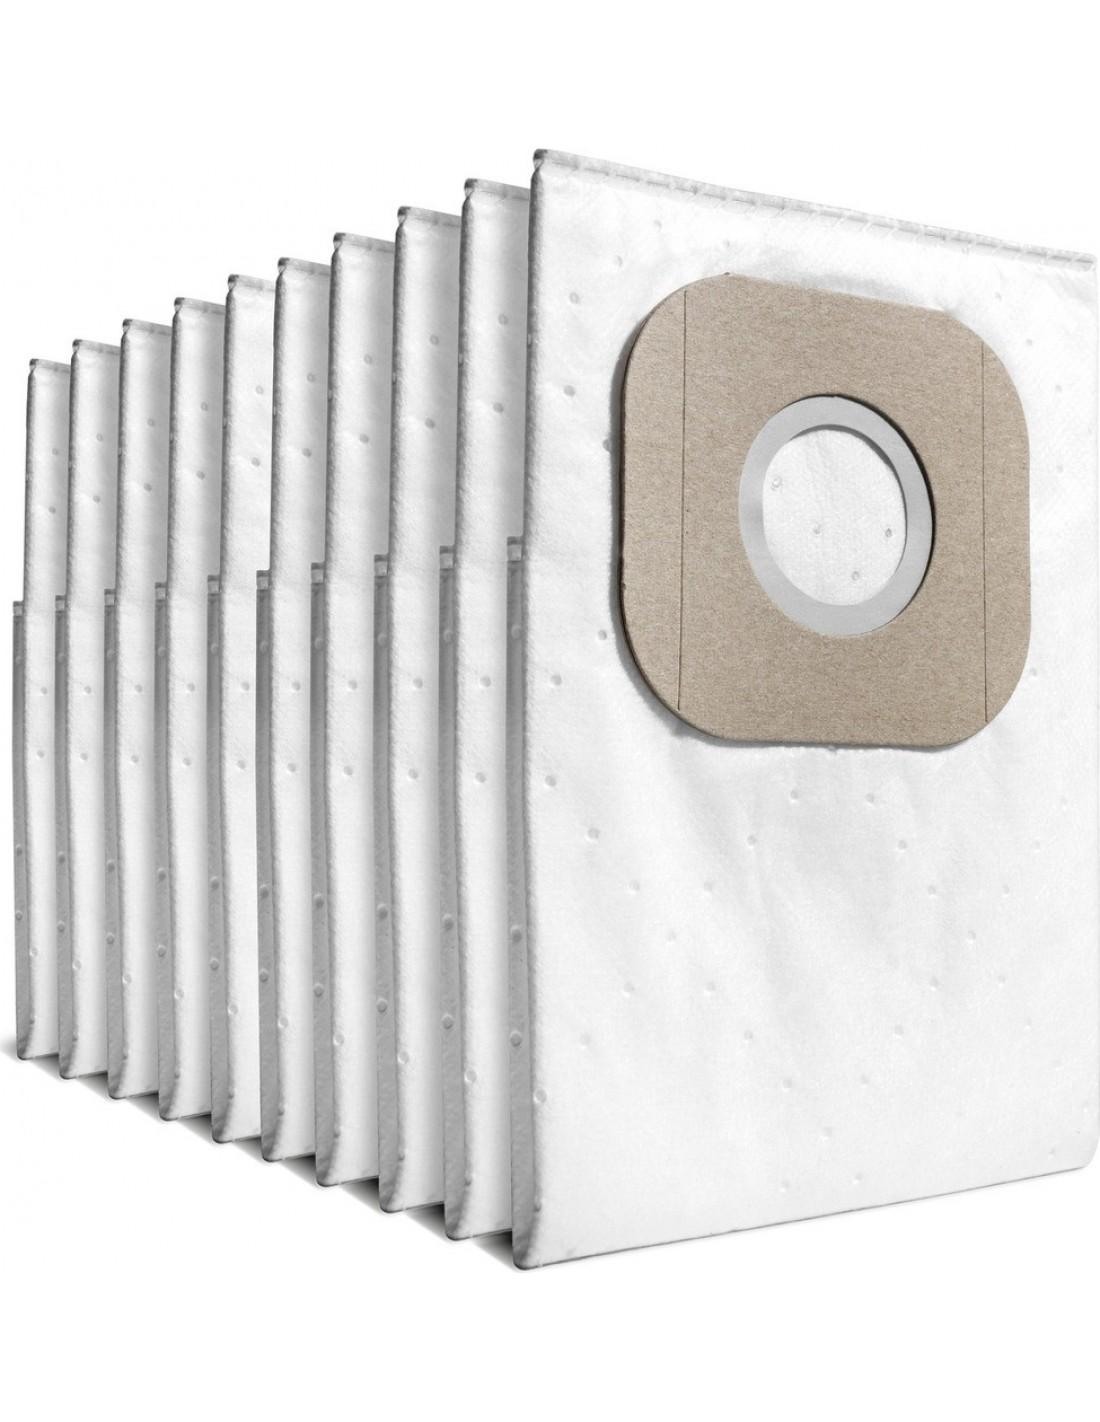 Sacchetti per aspirapolvere adatti per K/ärcher 6.904-123 NT 700 NT 702 NT700 NT702 100 x 41,5 cm